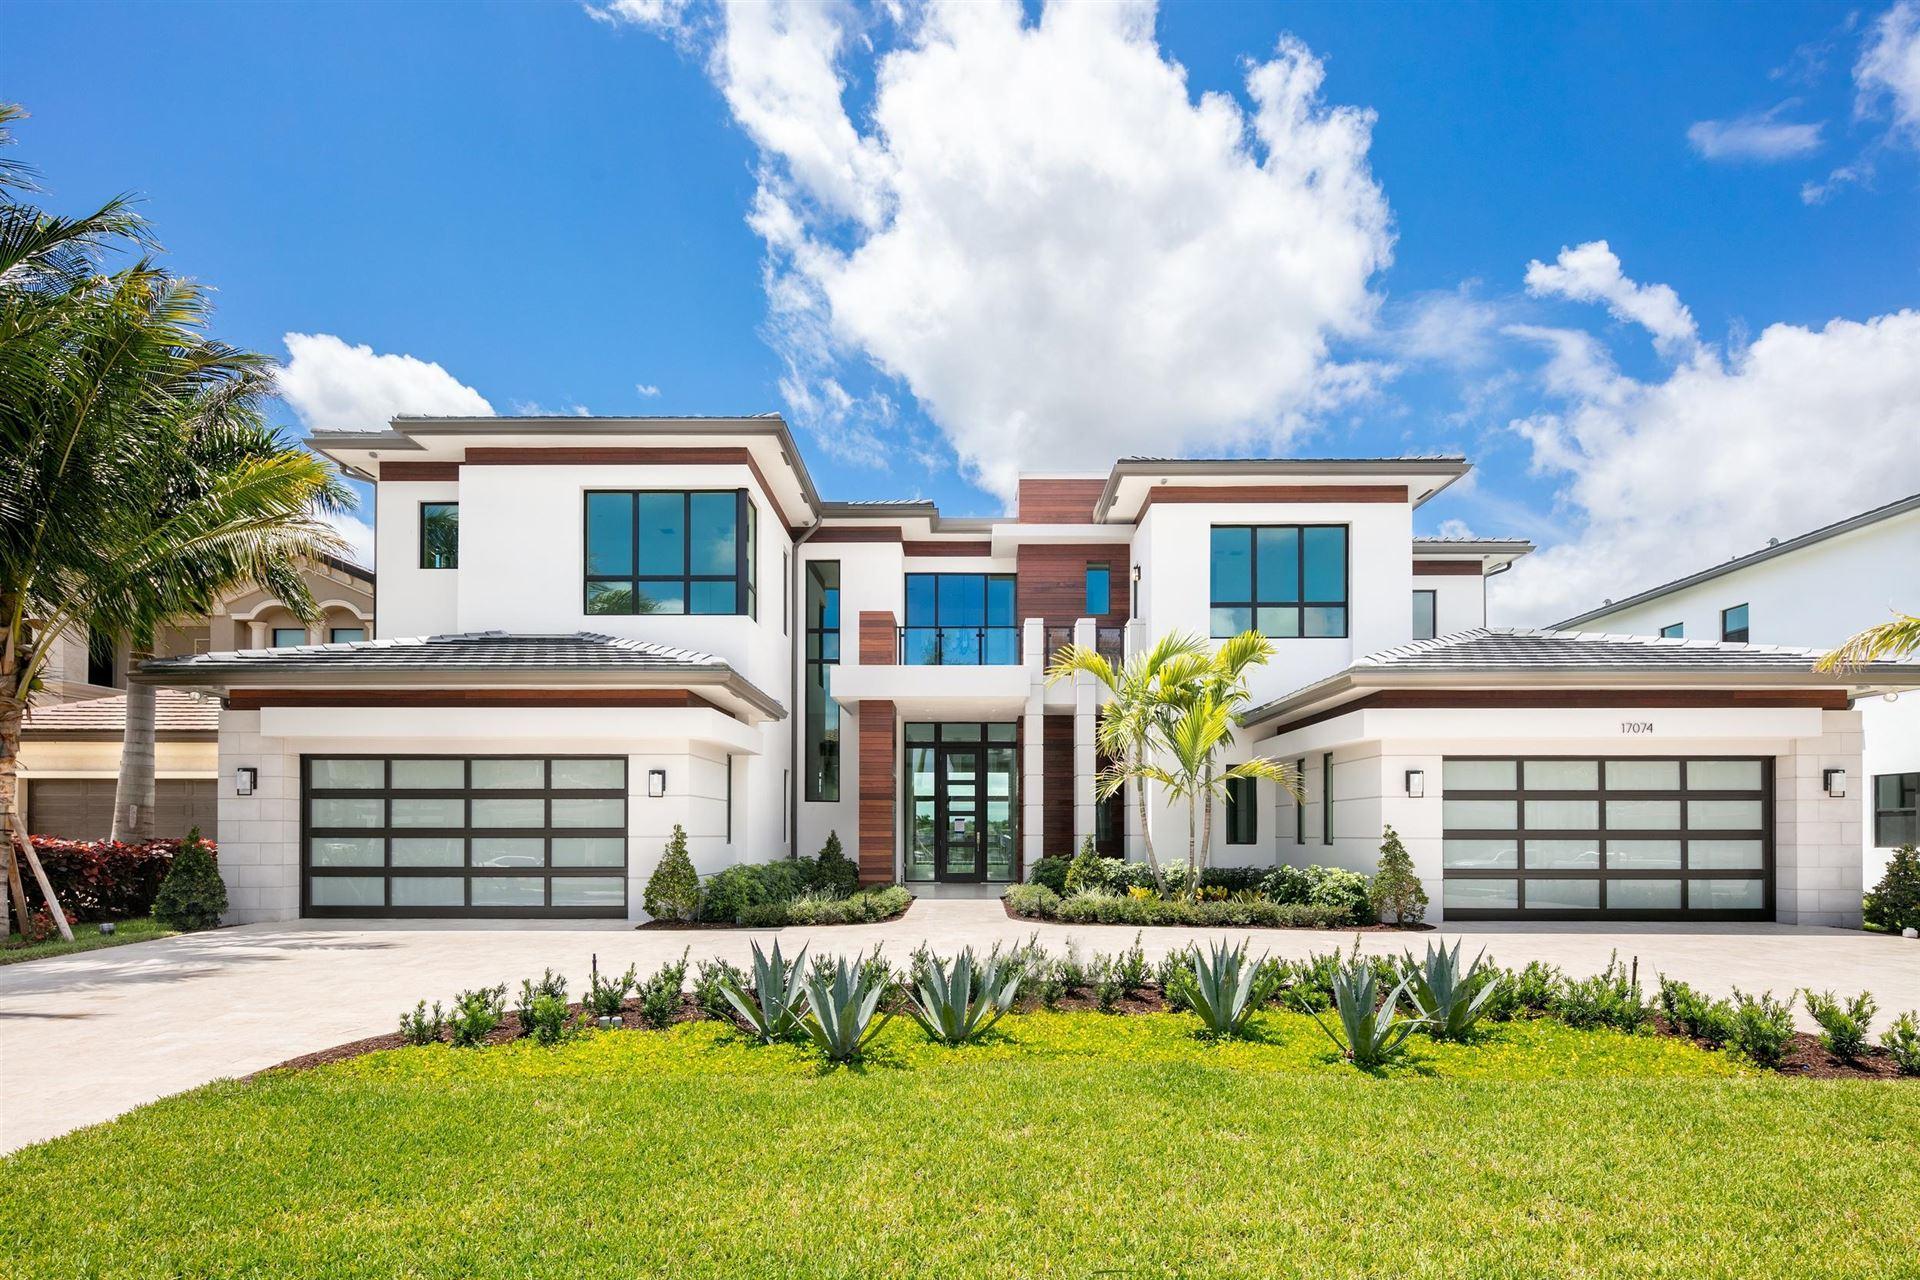 17074 Brulee Breeze Way, Boca Raton, FL 33496 - MLS#: RX-10718141